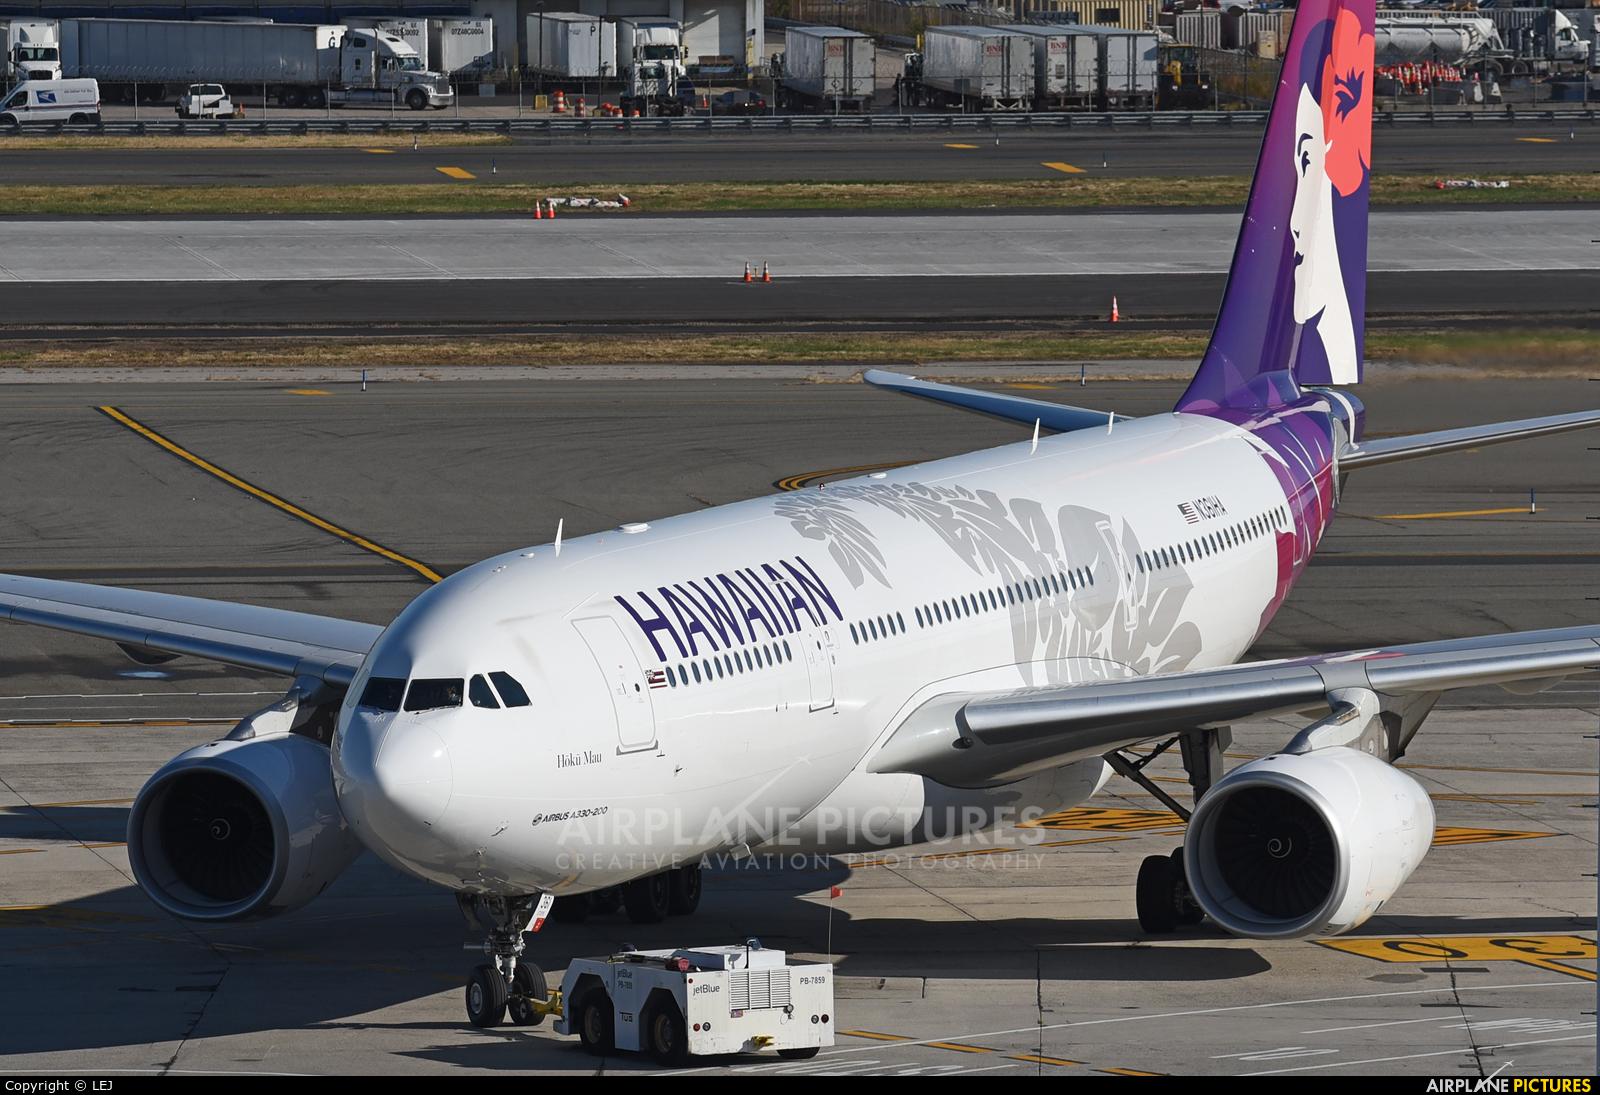 Hawaiian Airlines N361HA aircraft at New York - John F. Kennedy Intl